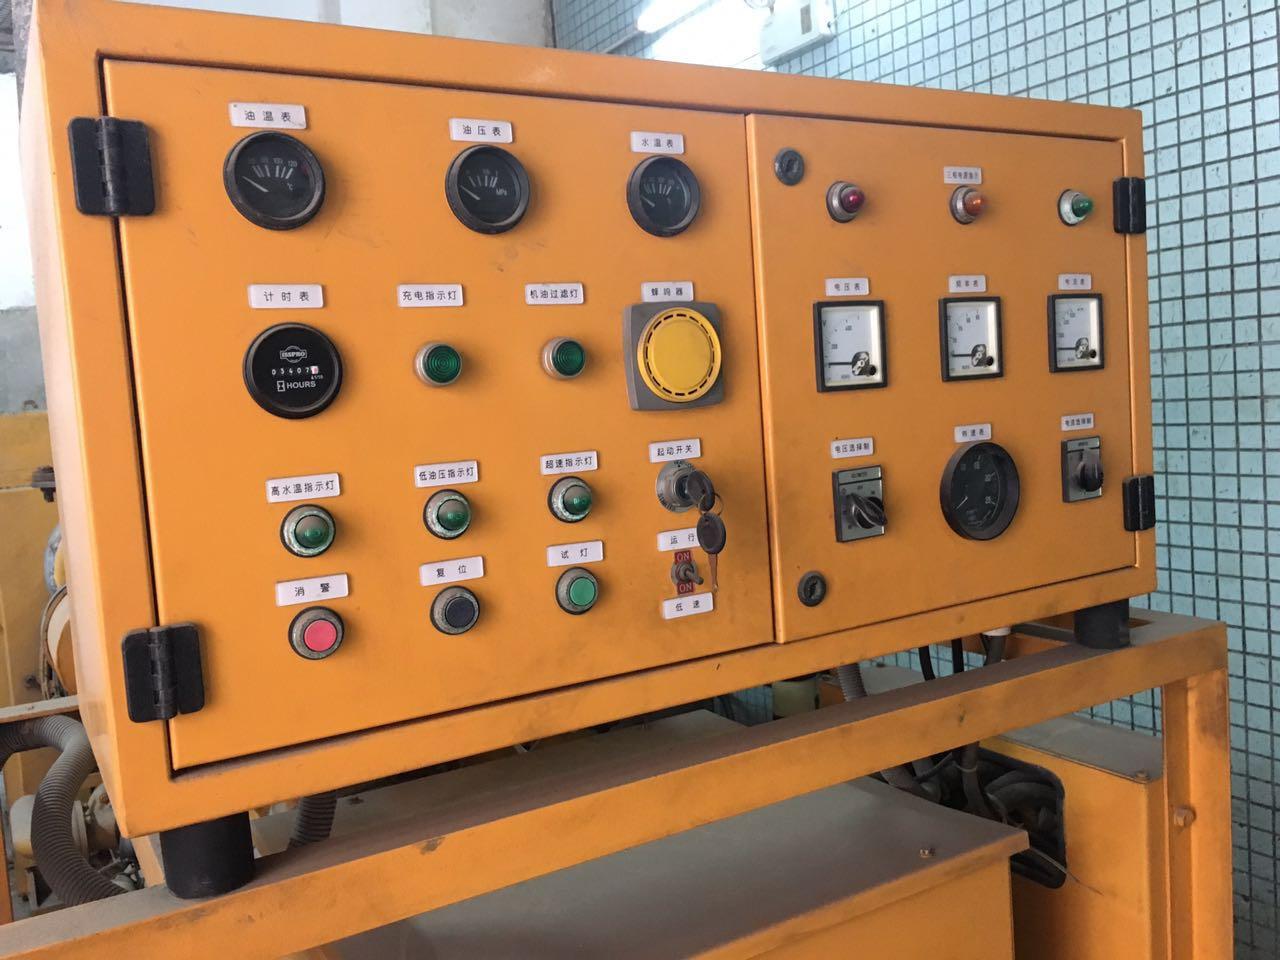 used 280kw Mitsubishi diesel genset control panel